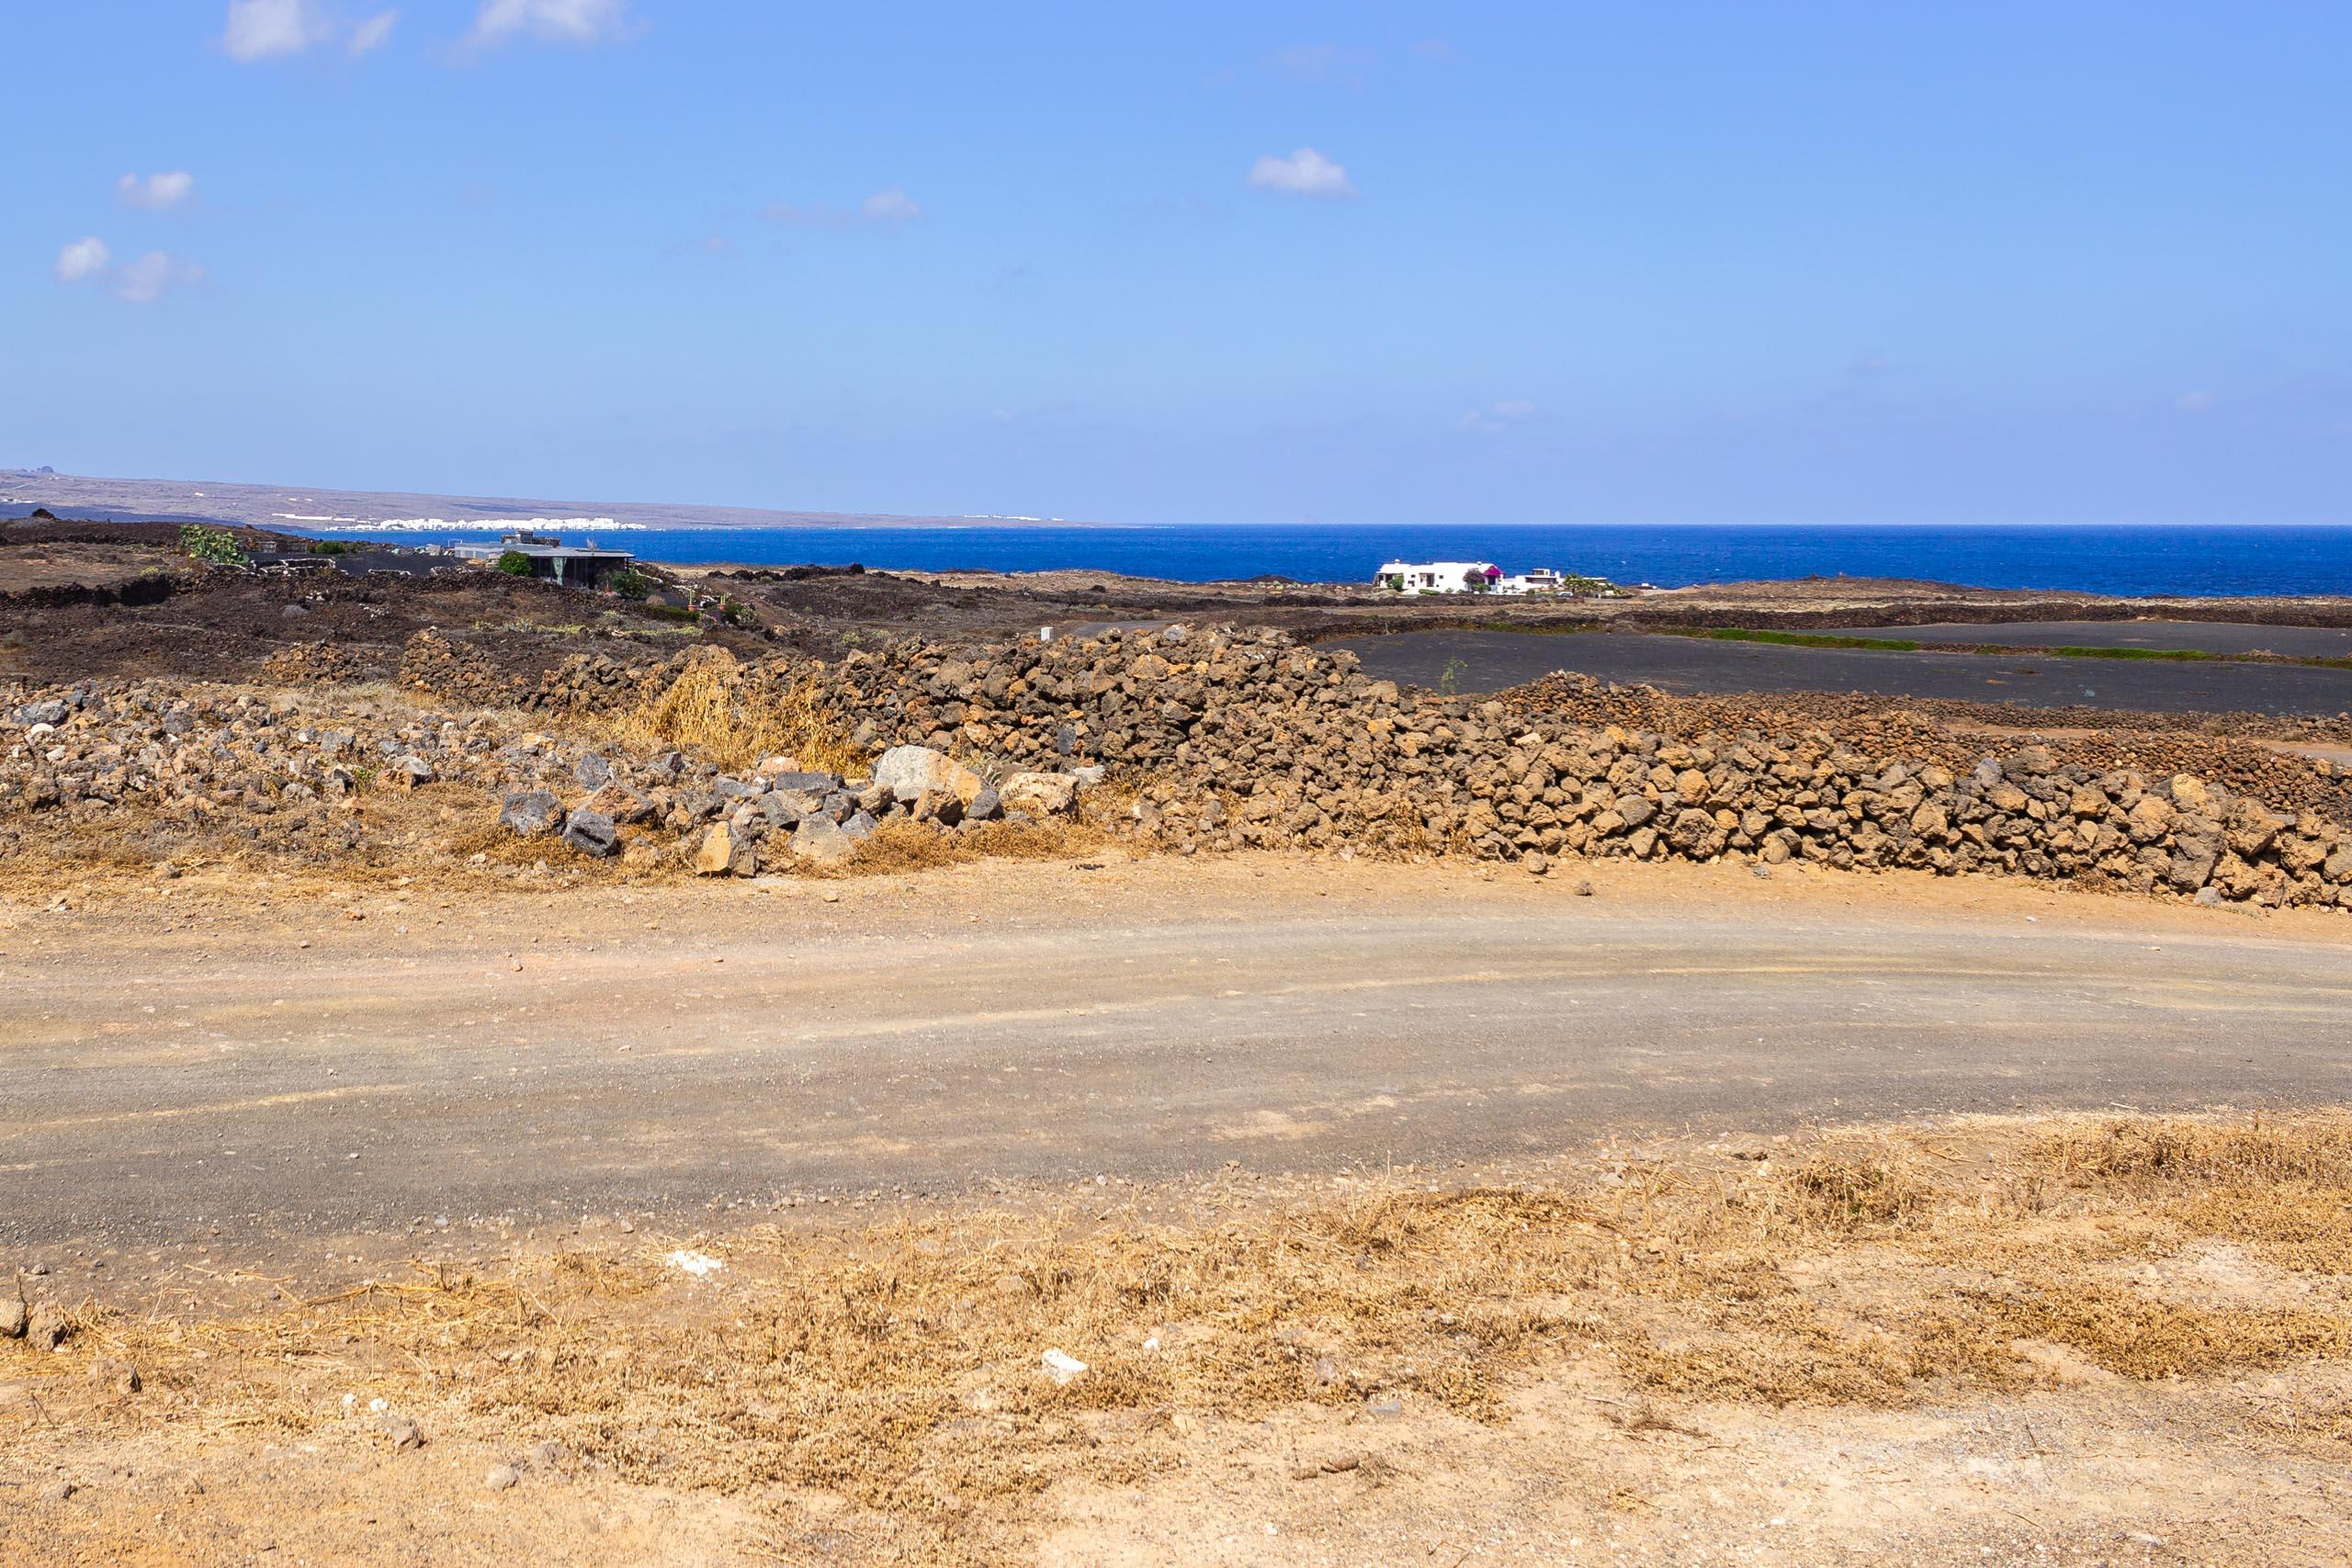 2015 09 Lanzarote Mala 001